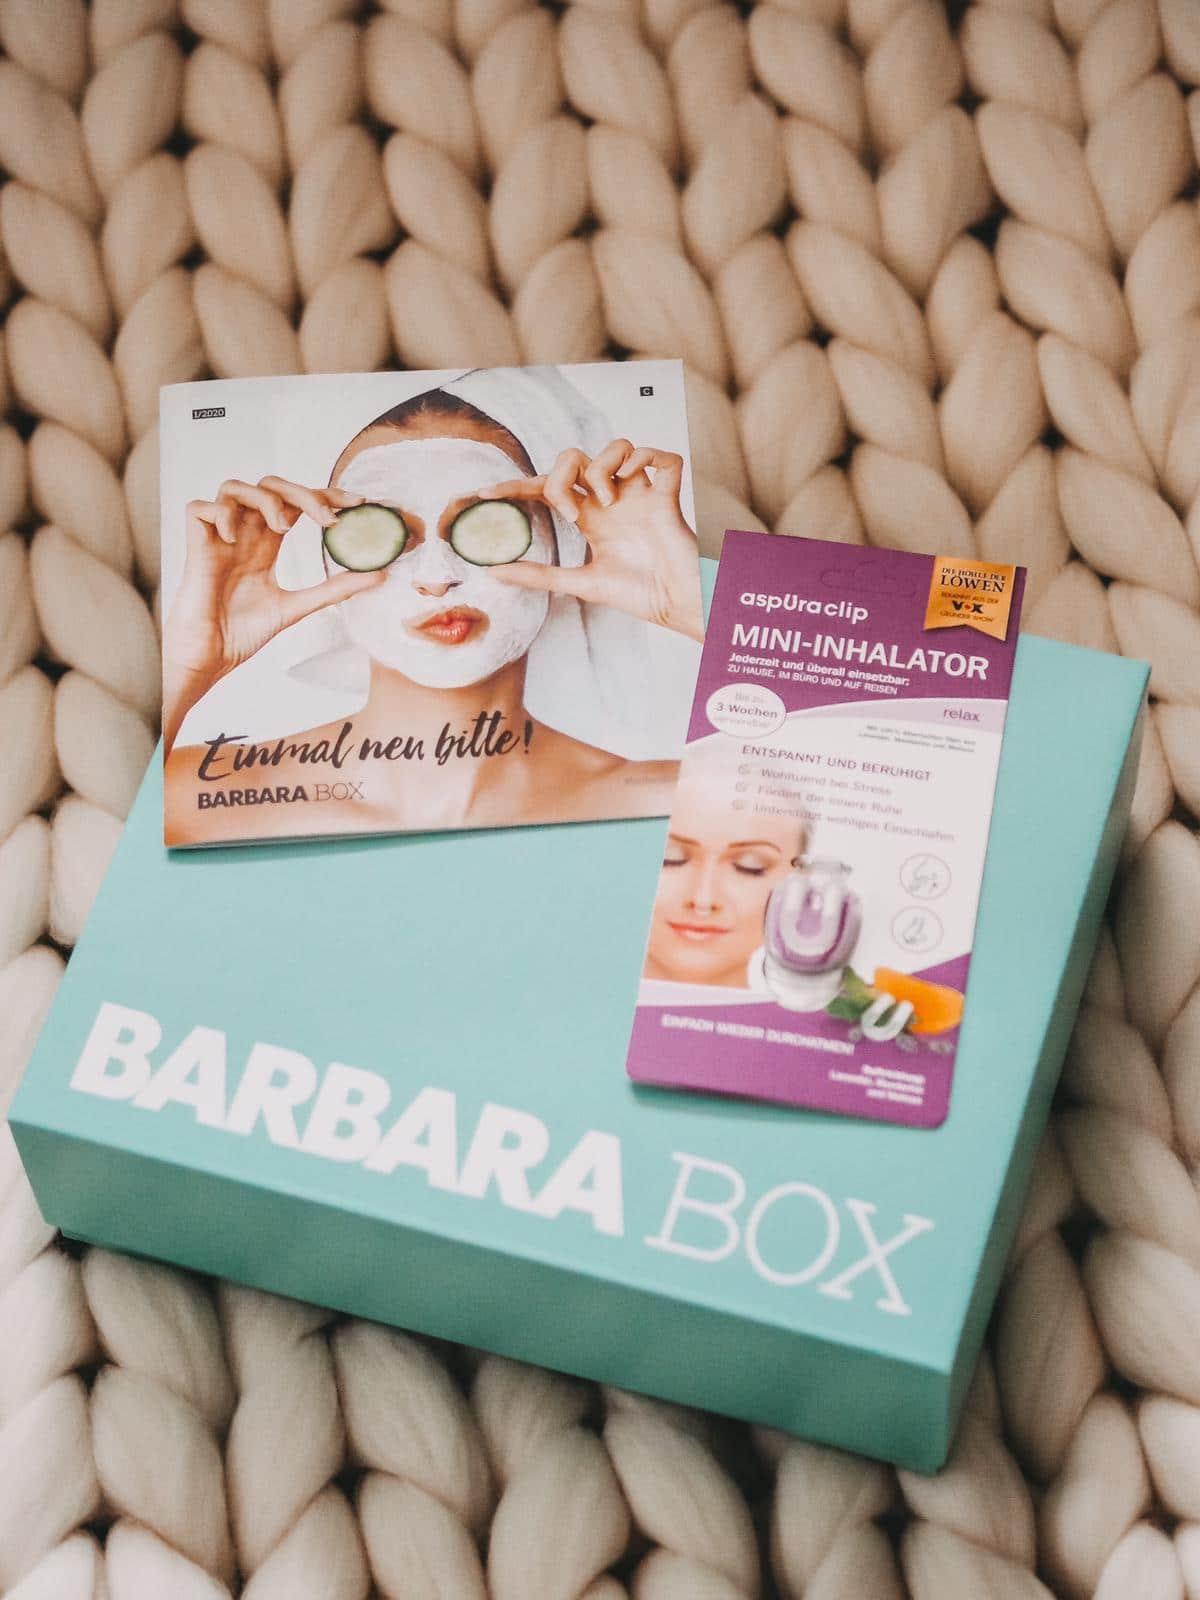 aspuraclip Mini-Inhalator aus der Barbara Box Einmal neu bitte